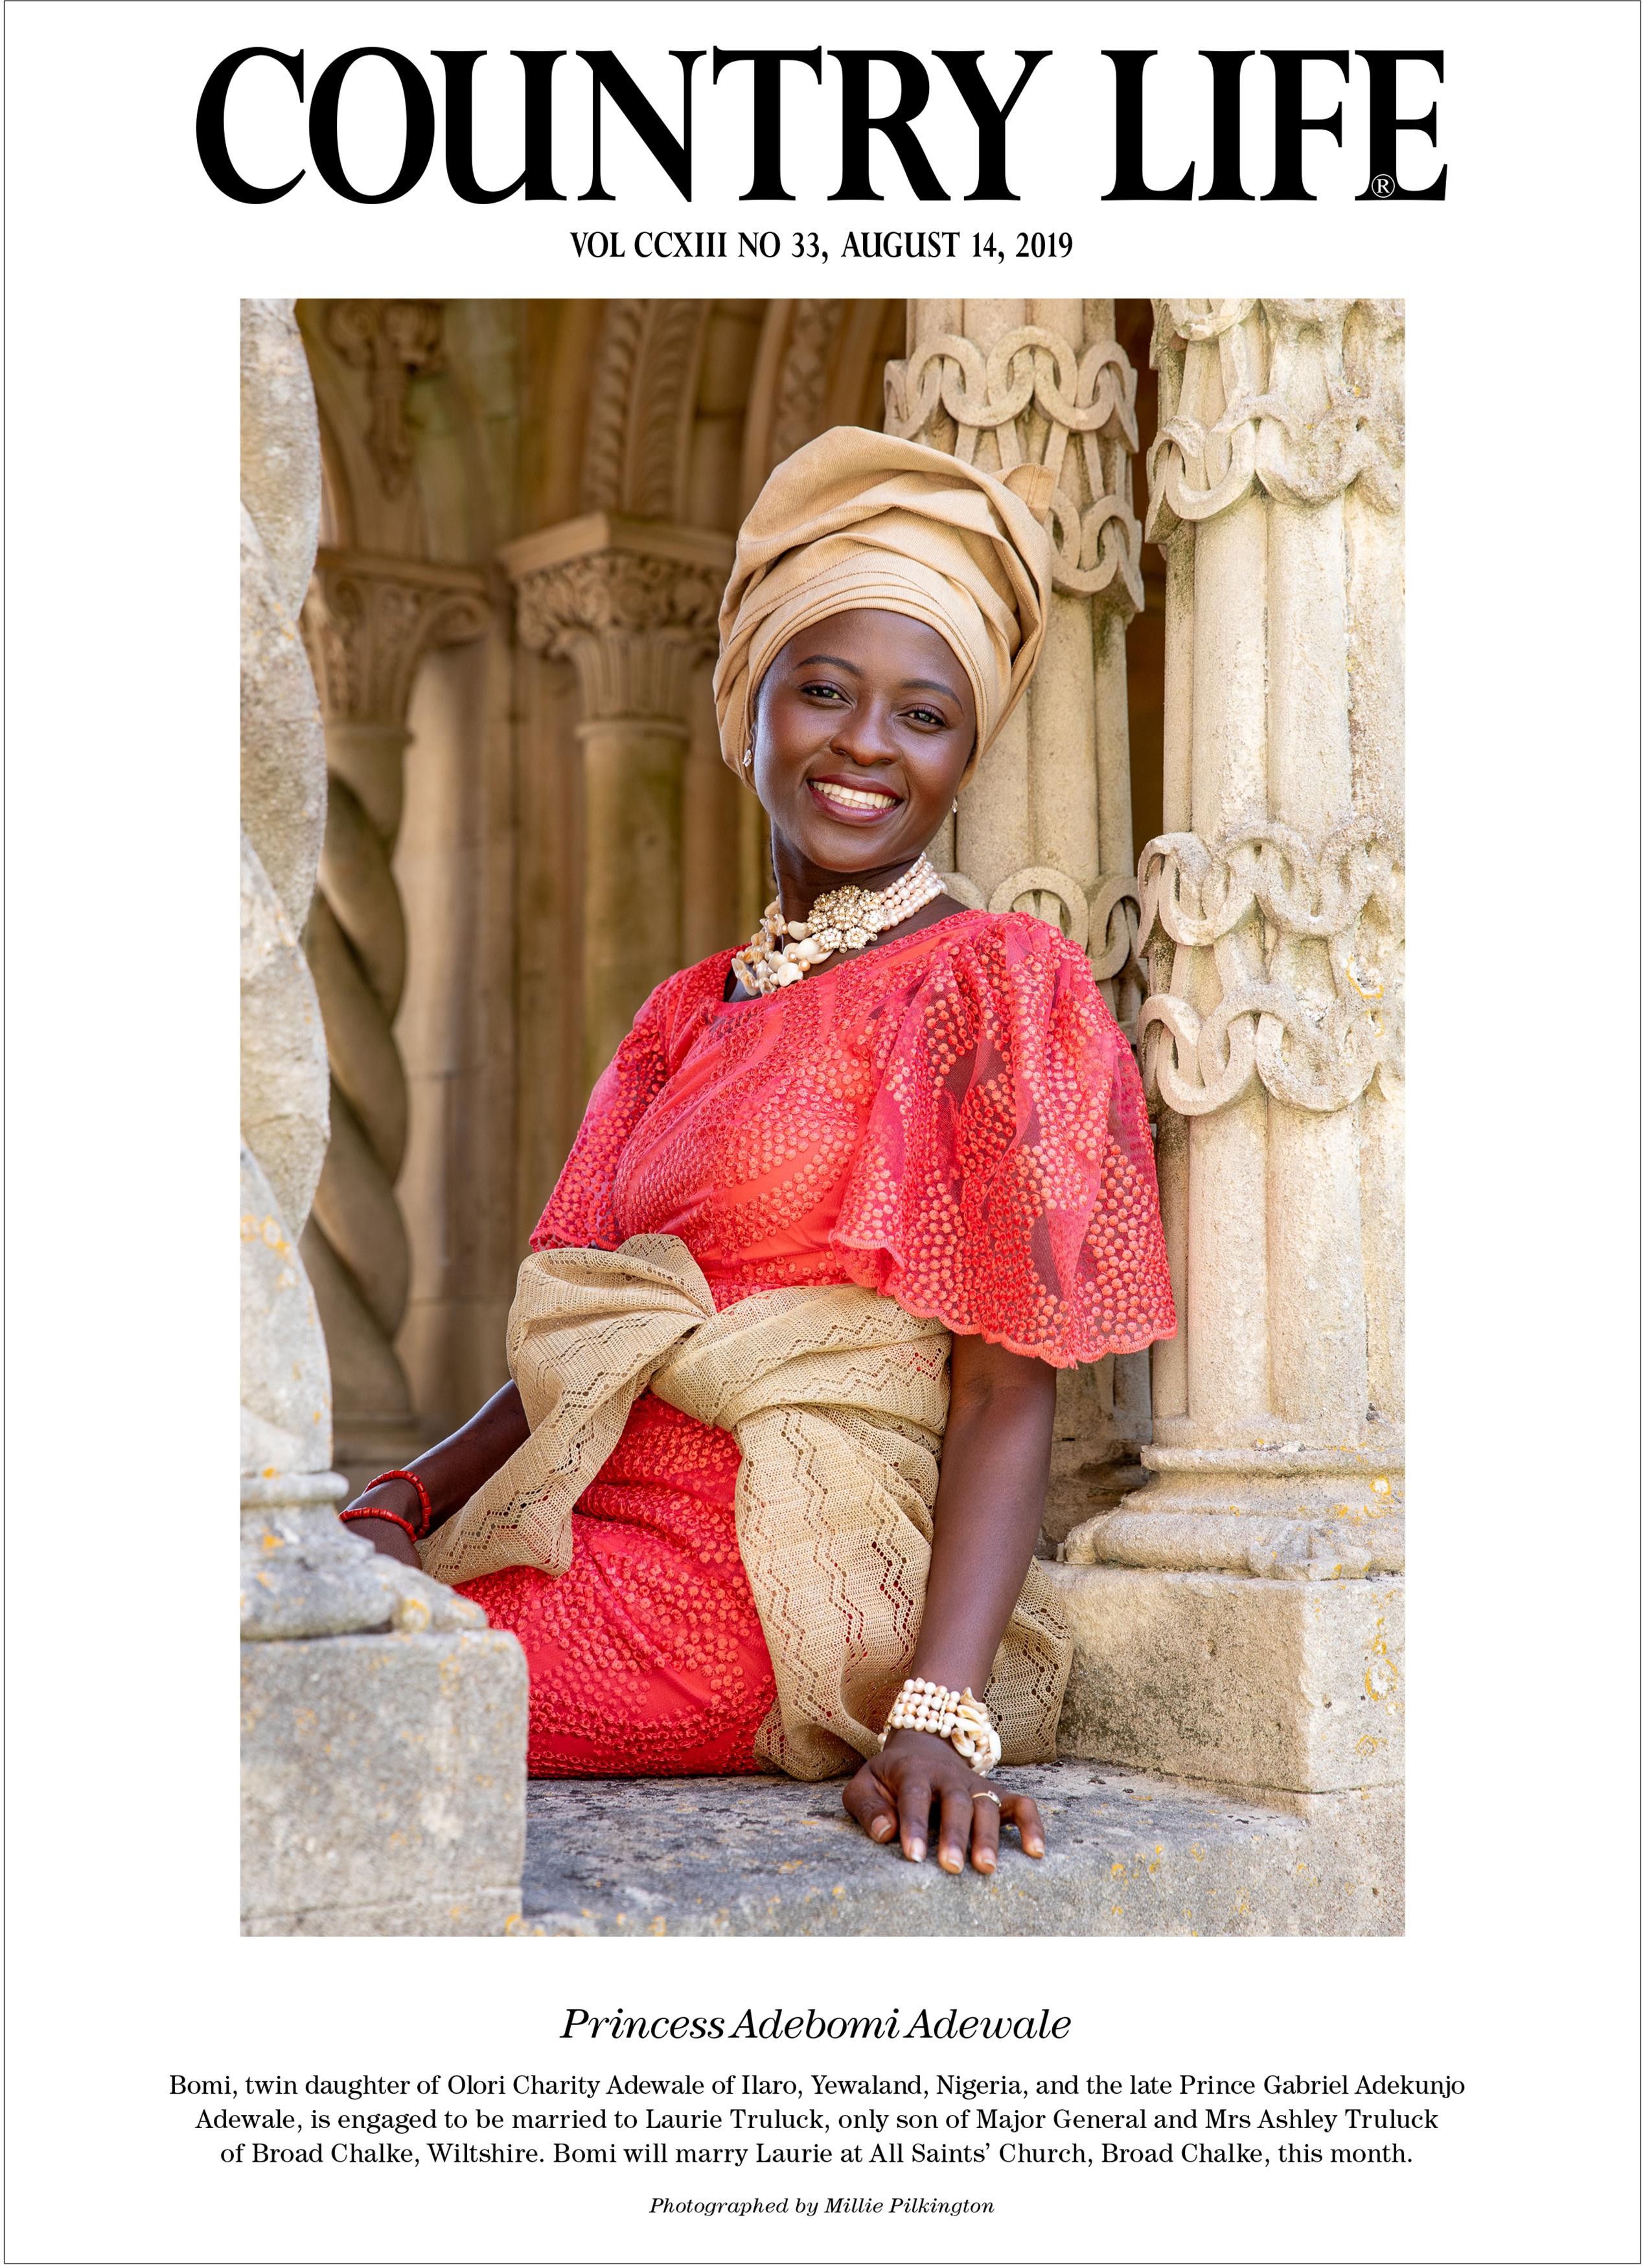 Princess Adebomi Adewale